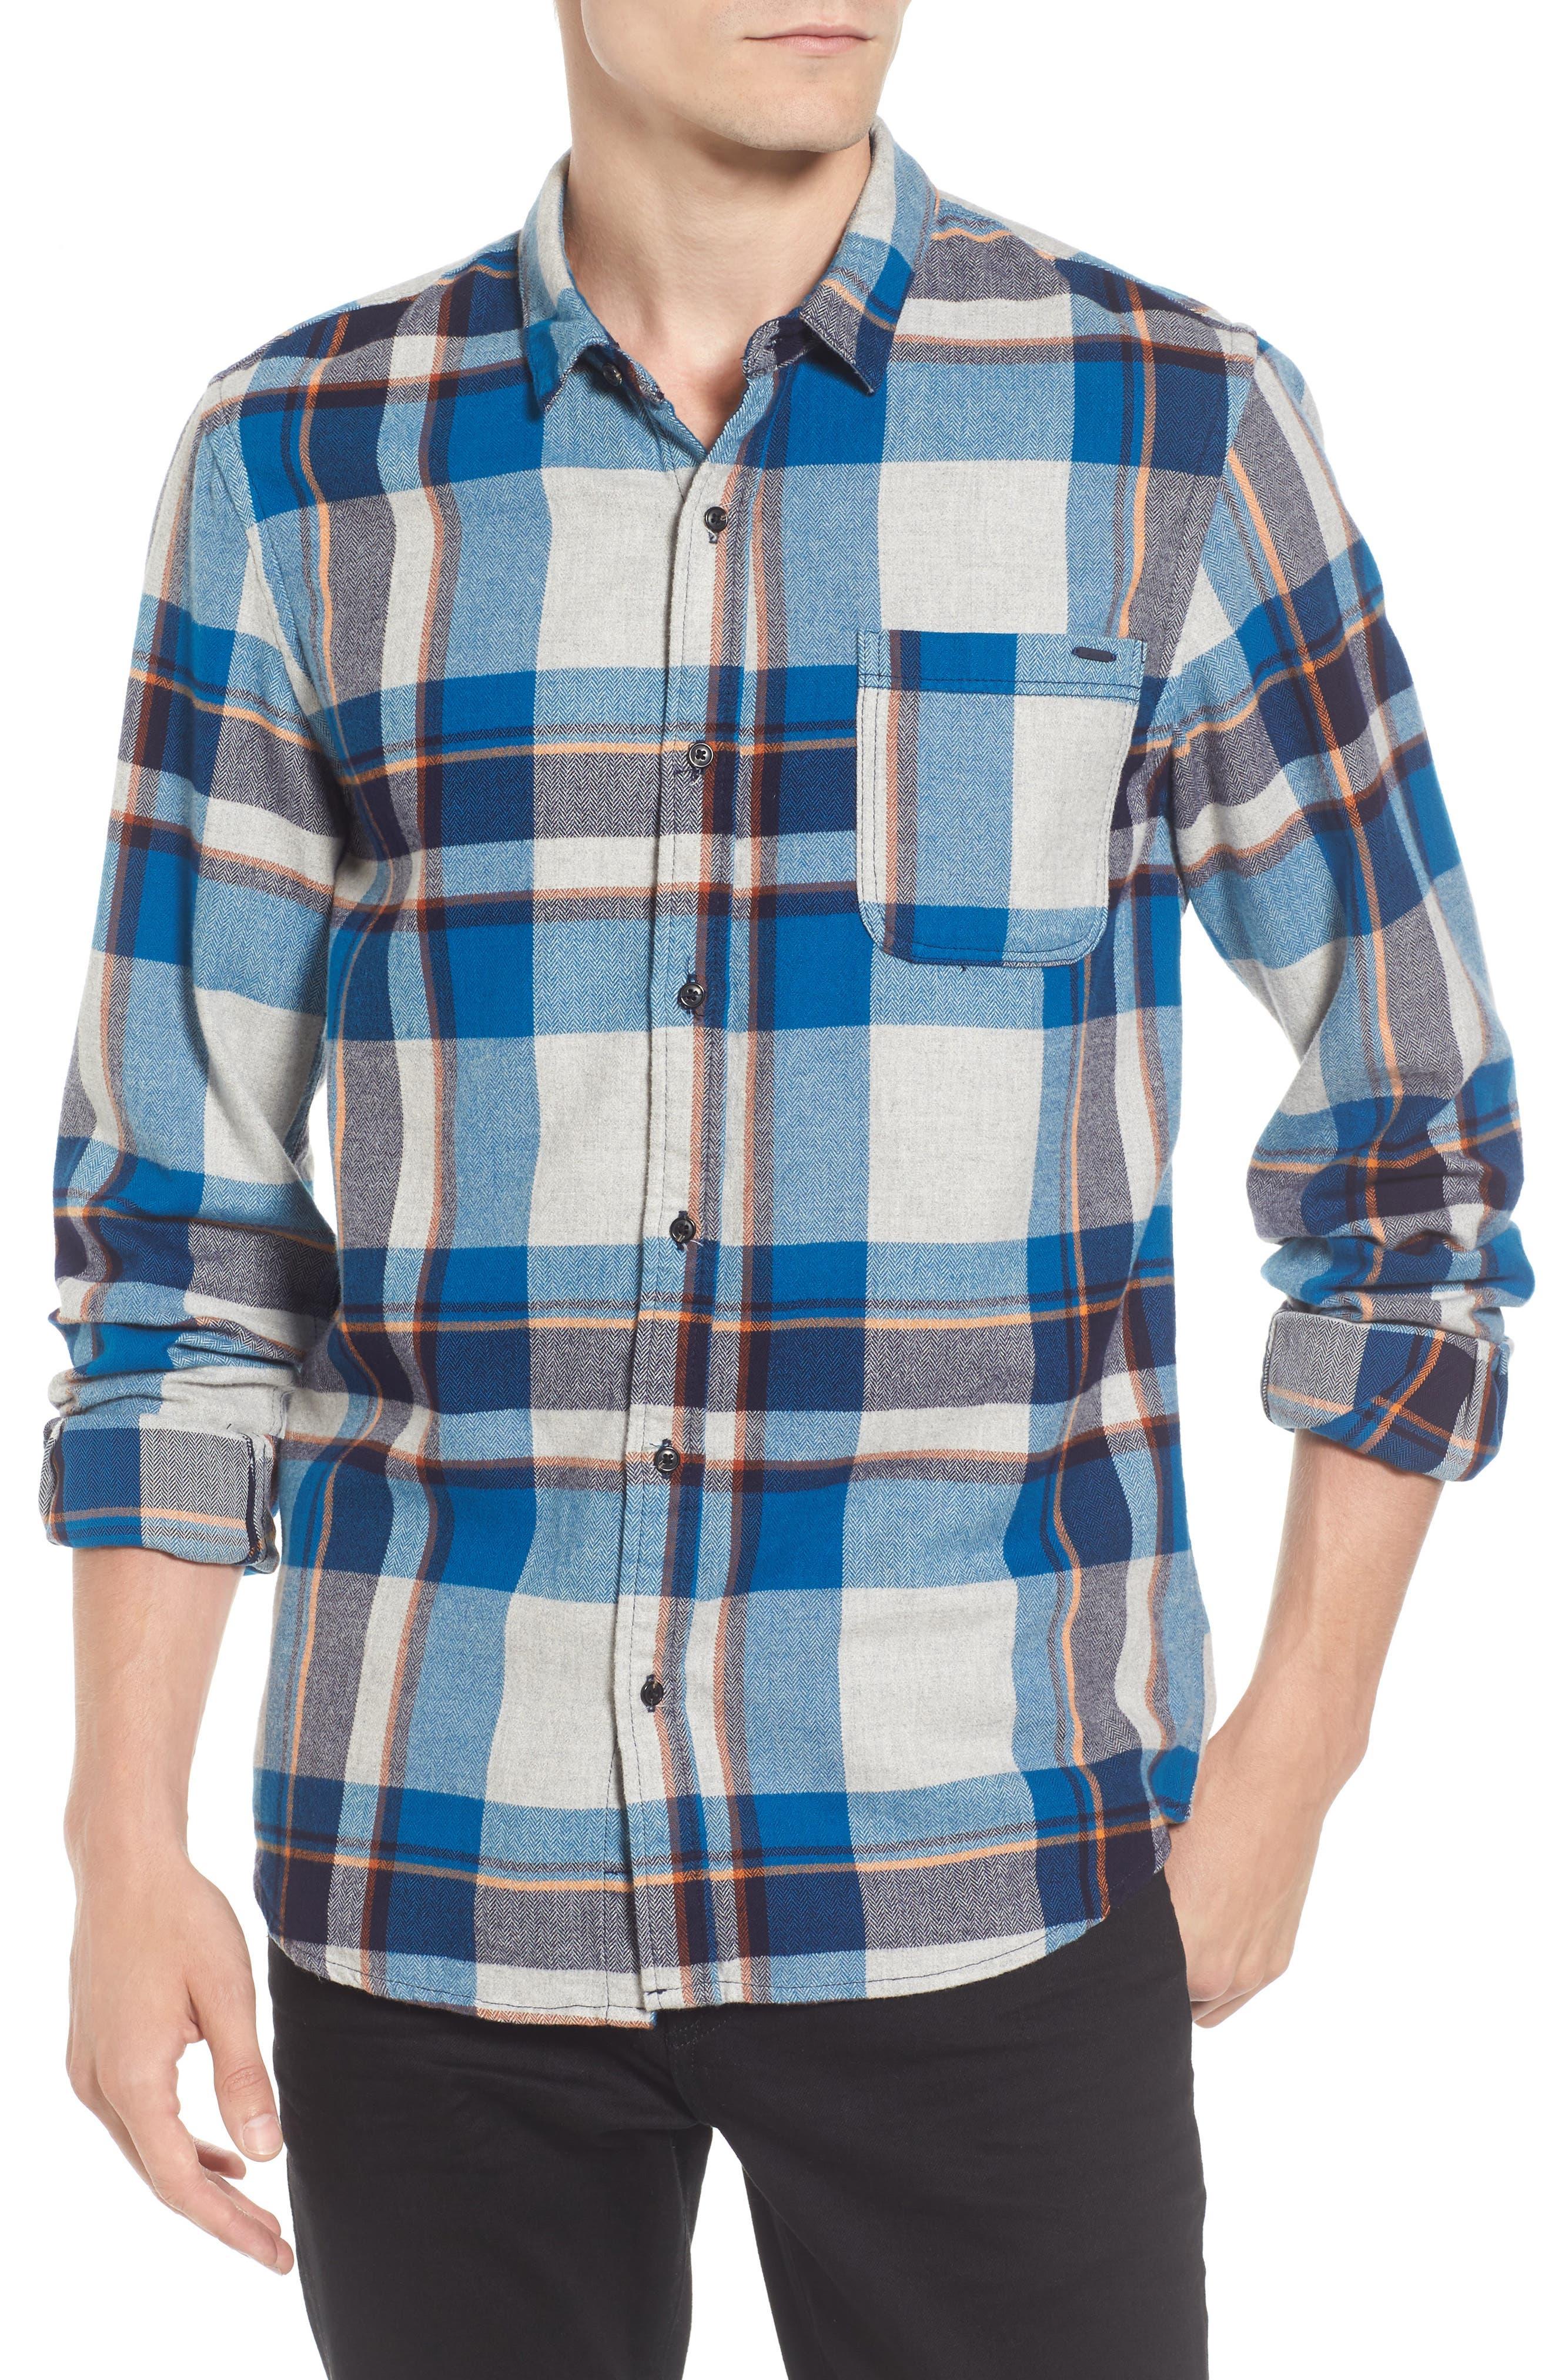 Scotch & Soda Brushed Flannel Plaid Shirt